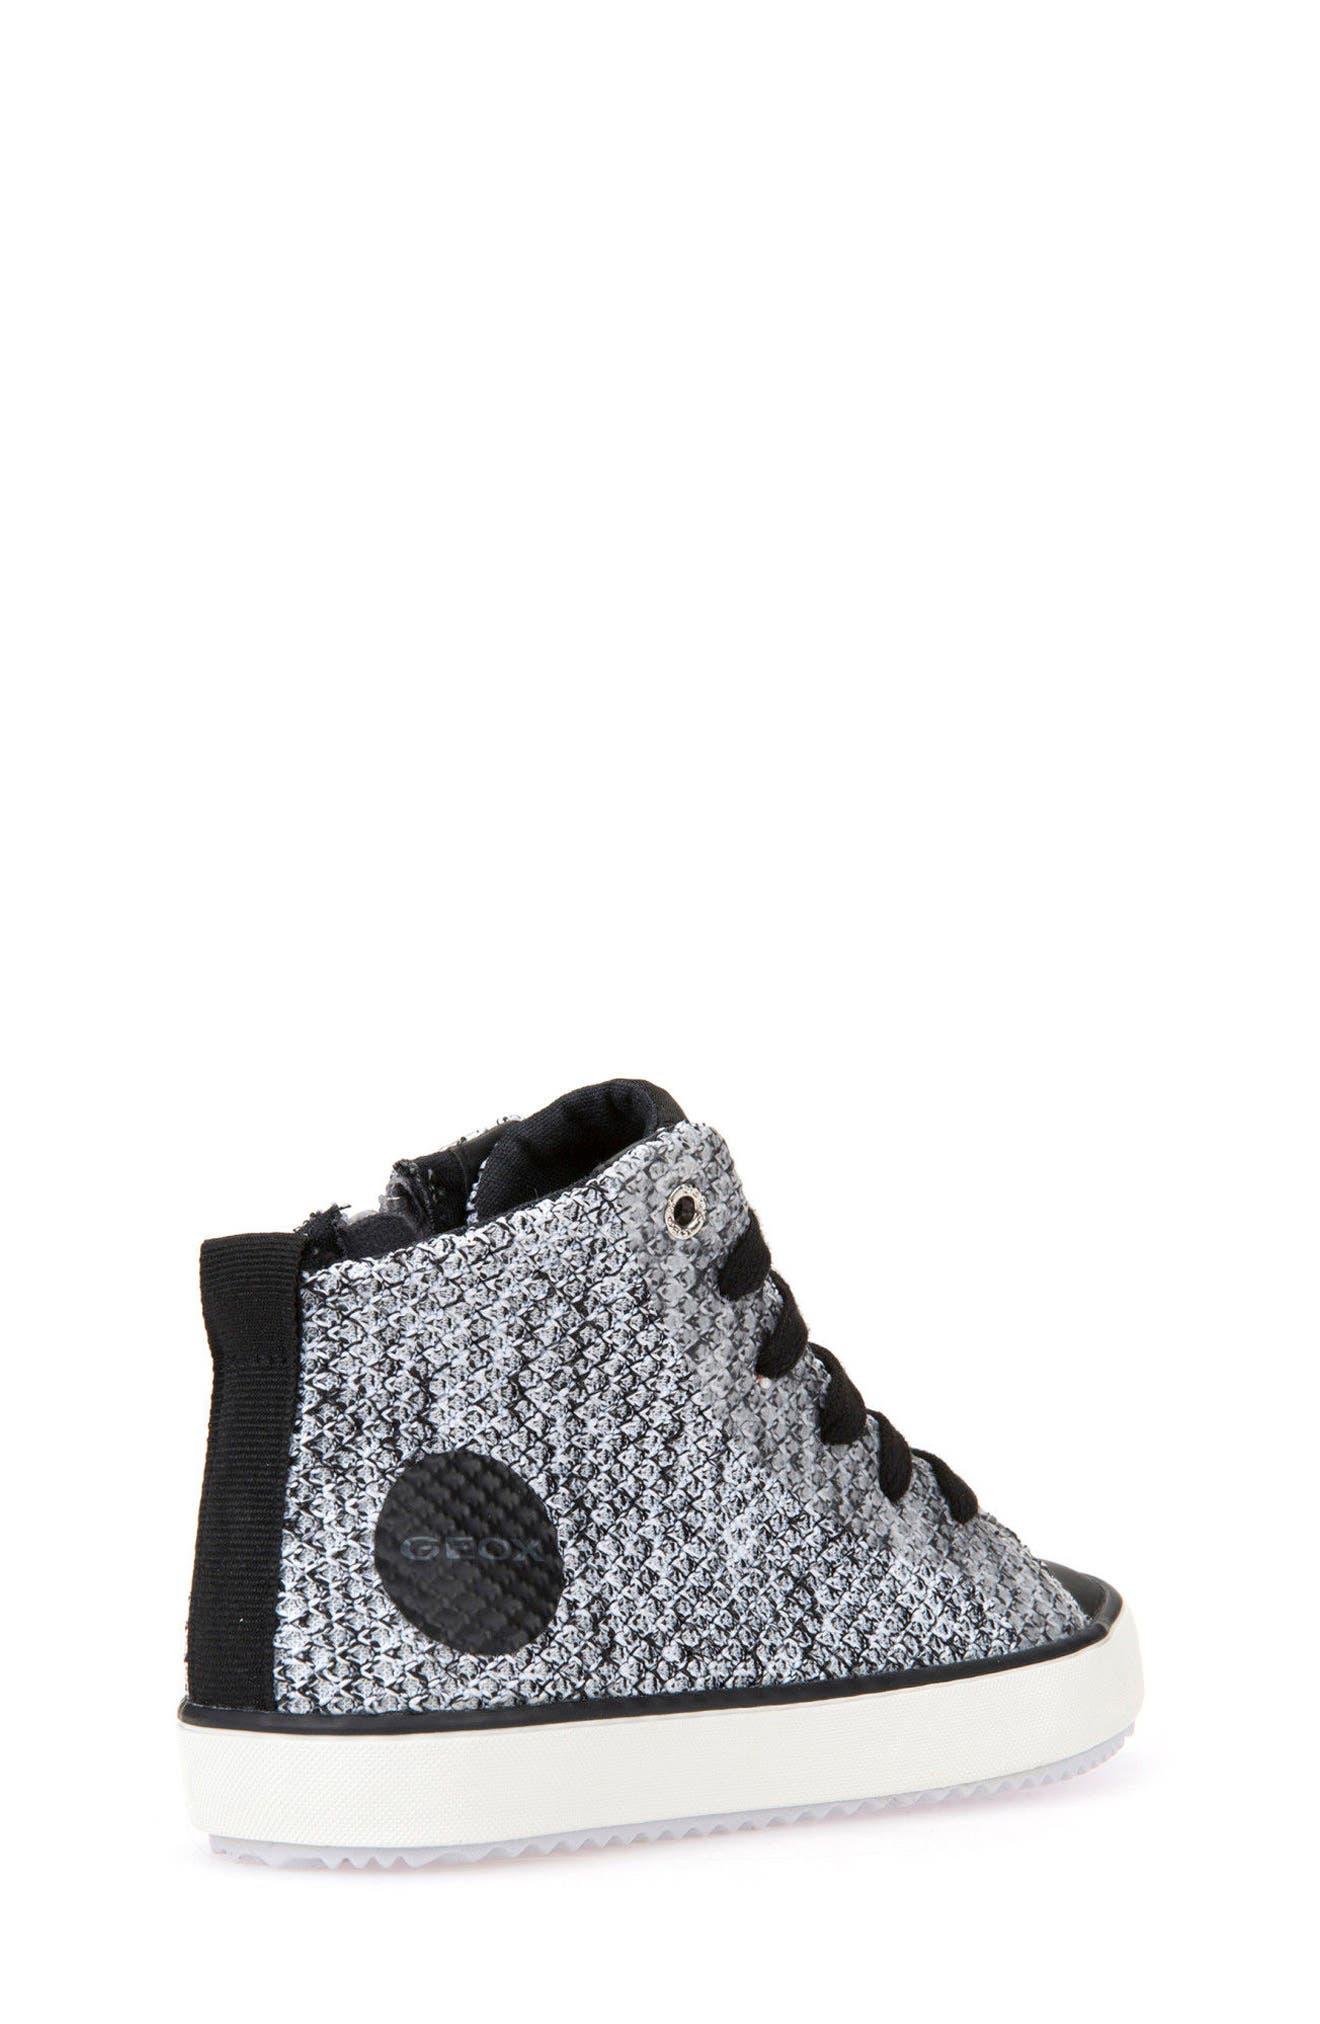 Alonisso Knit Mid Top Sneaker,                             Alternate thumbnail 2, color,                             WHITE/ BLACK